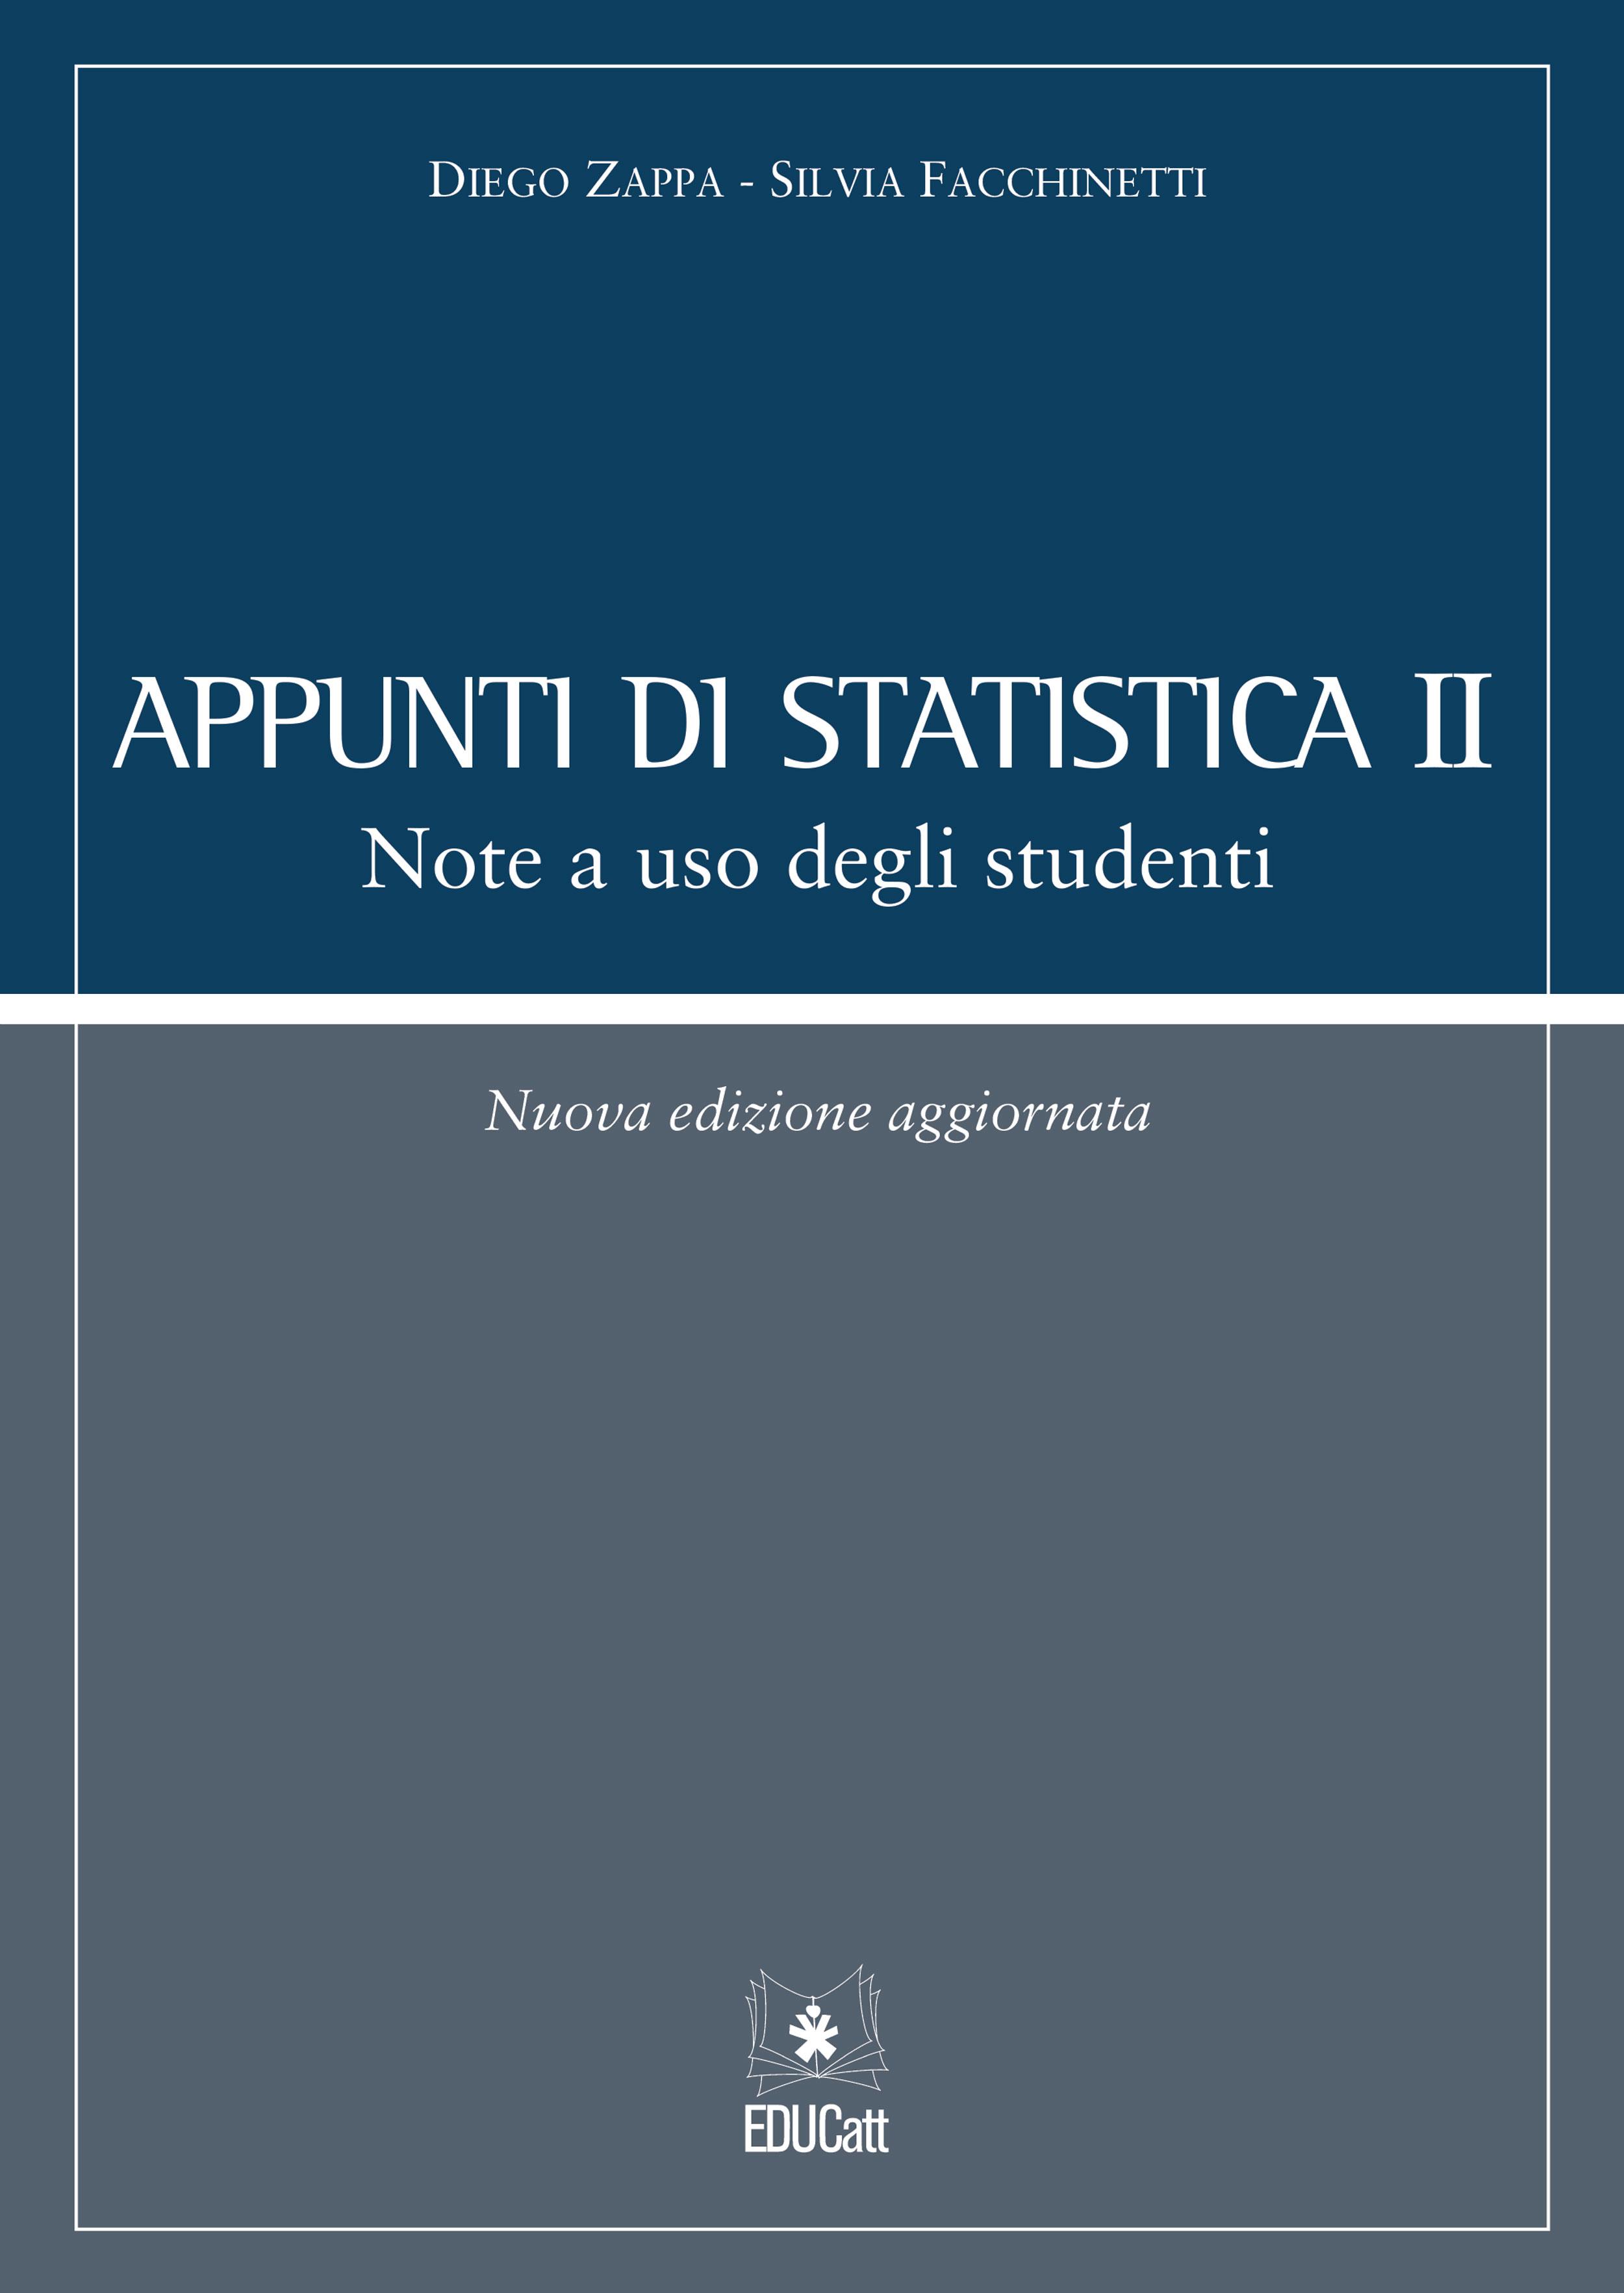 APPUNTI DI STATISTICA II - NOTE A USO DEGLI STUDENTI